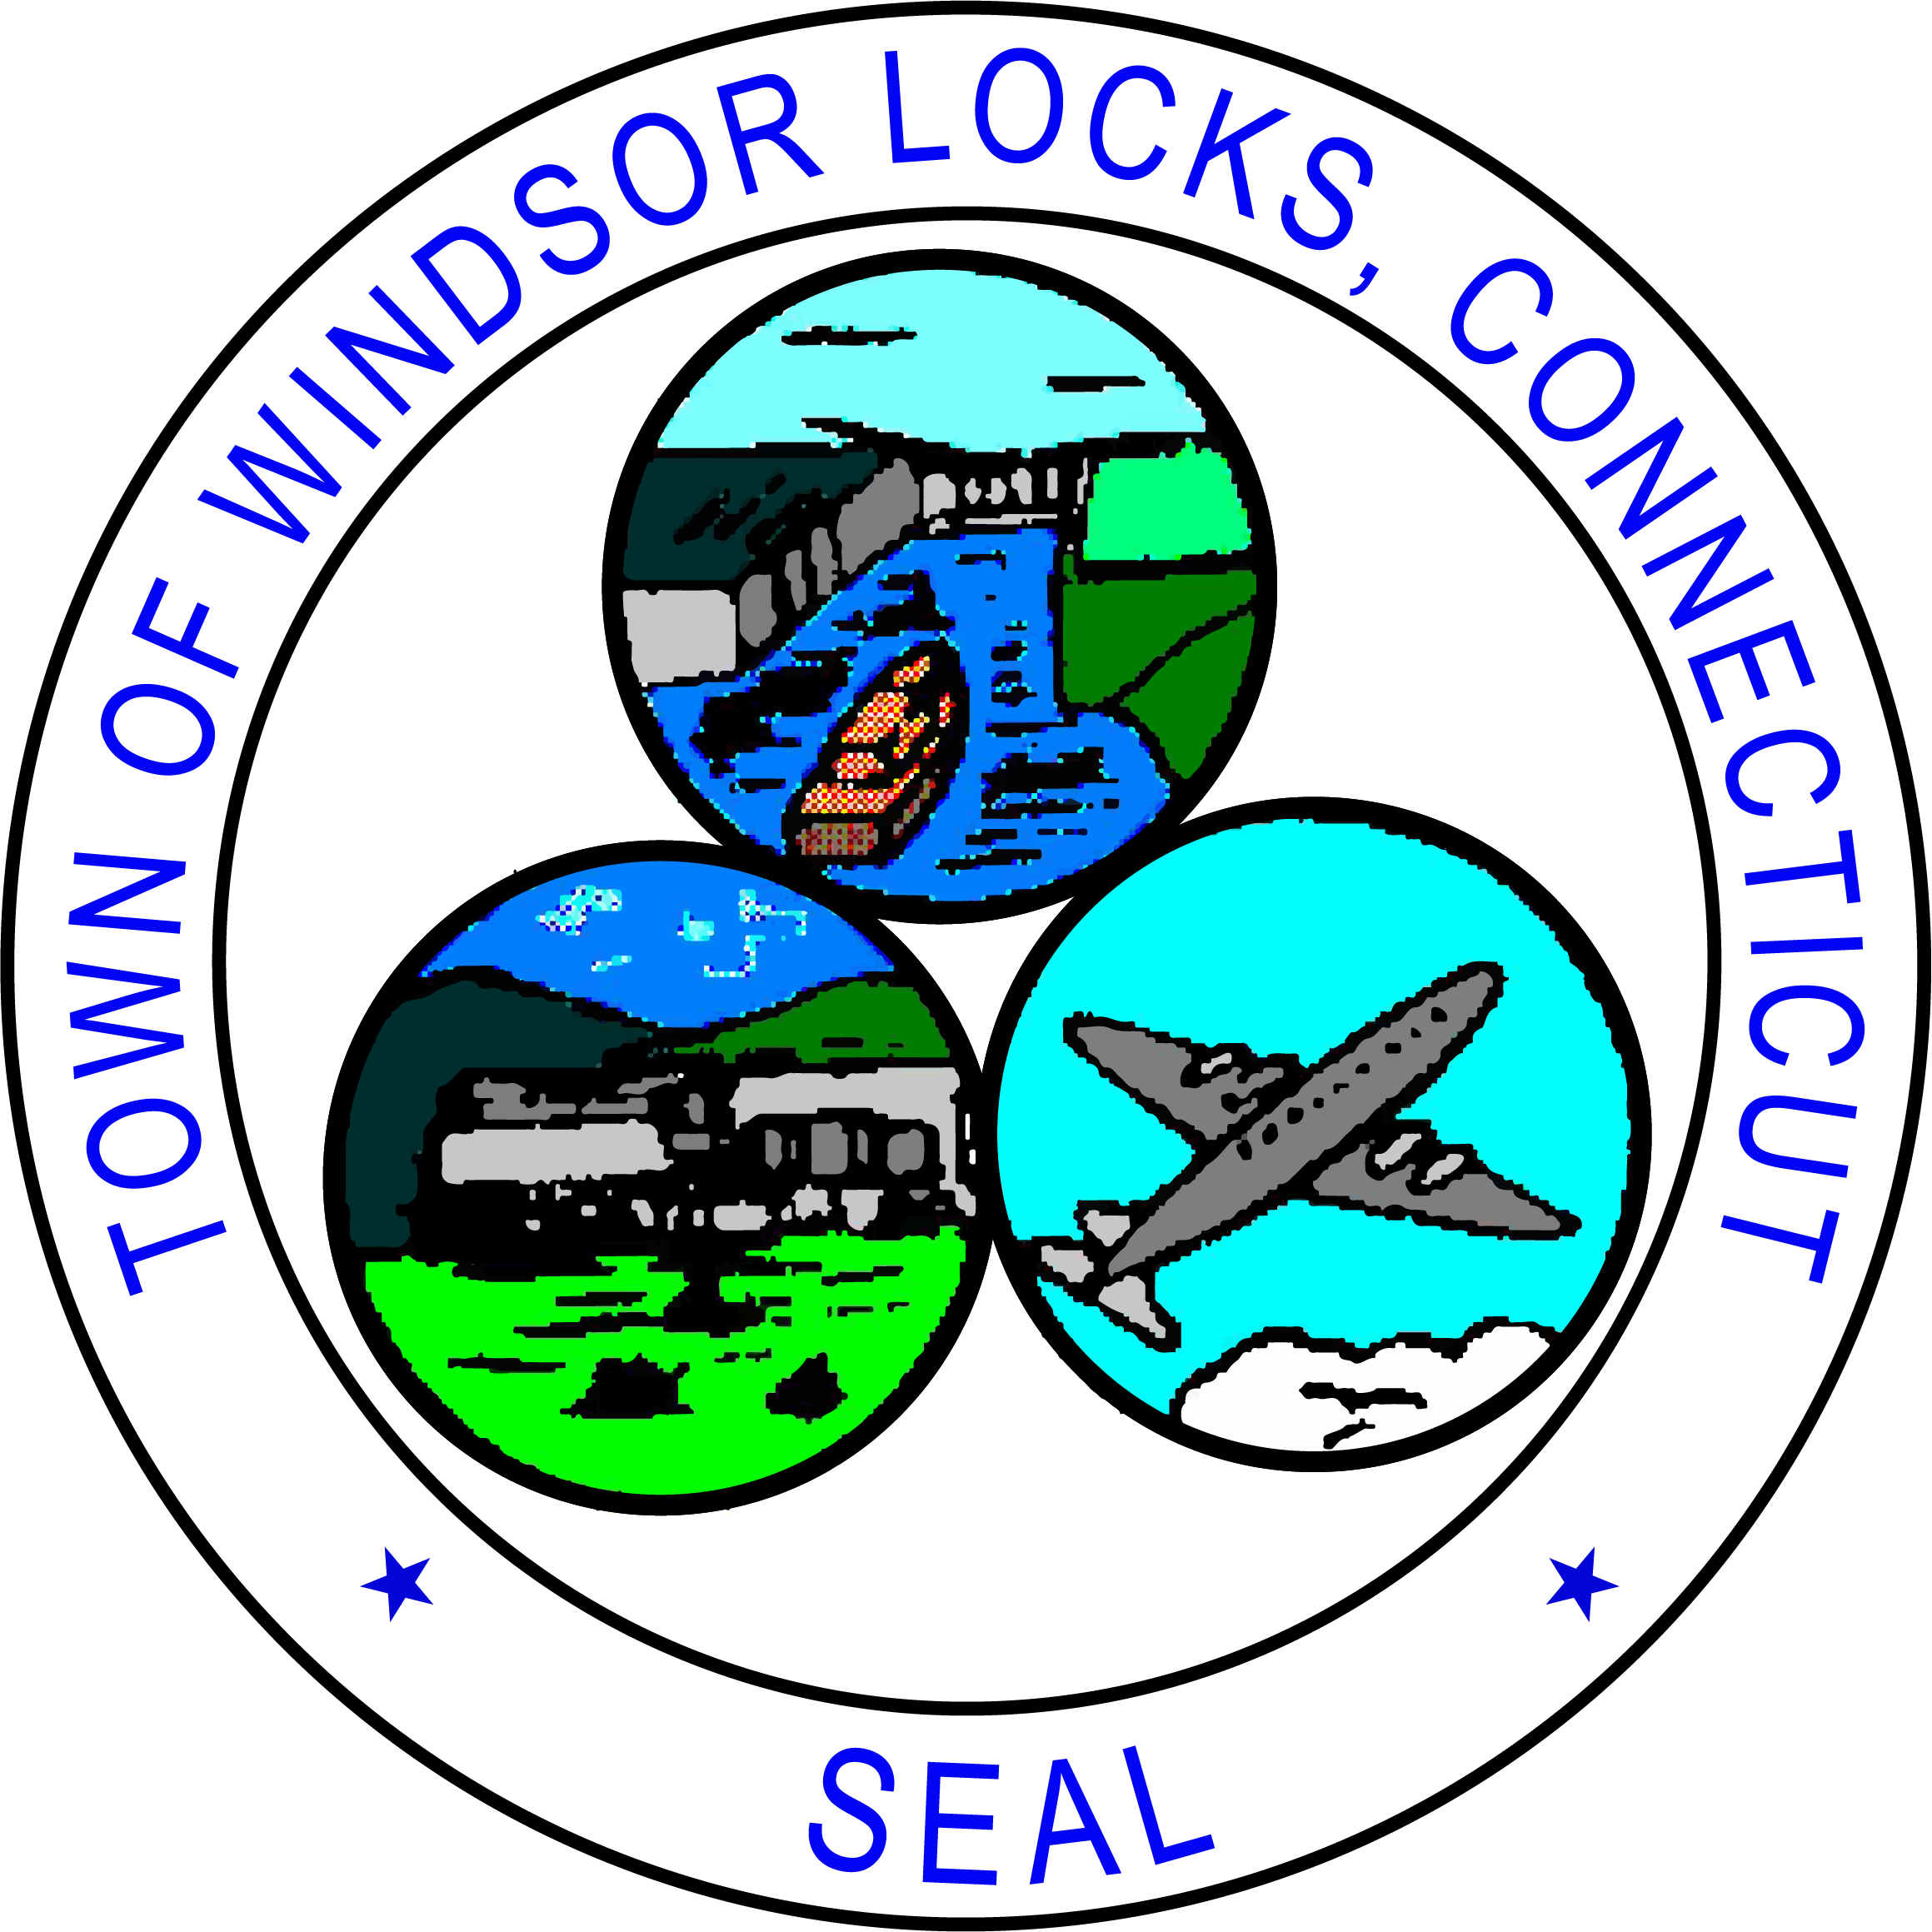 windsor locks logo